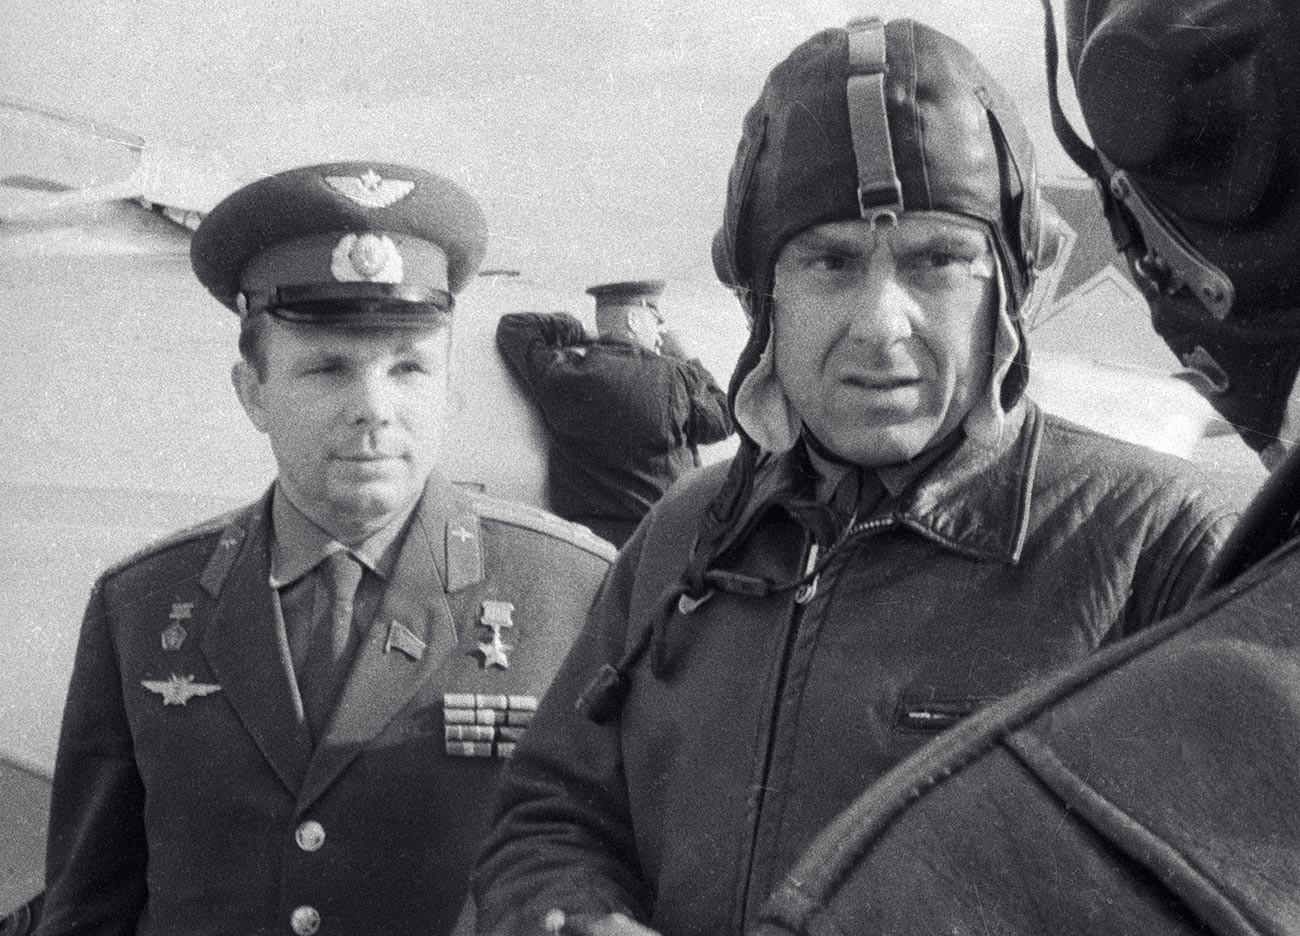 Yuri Gagarin (kiri) ditugaskan untuk menggantikan Komarov jika sewaktu-waktu Vladimir Komarov tidak dapat terbang.